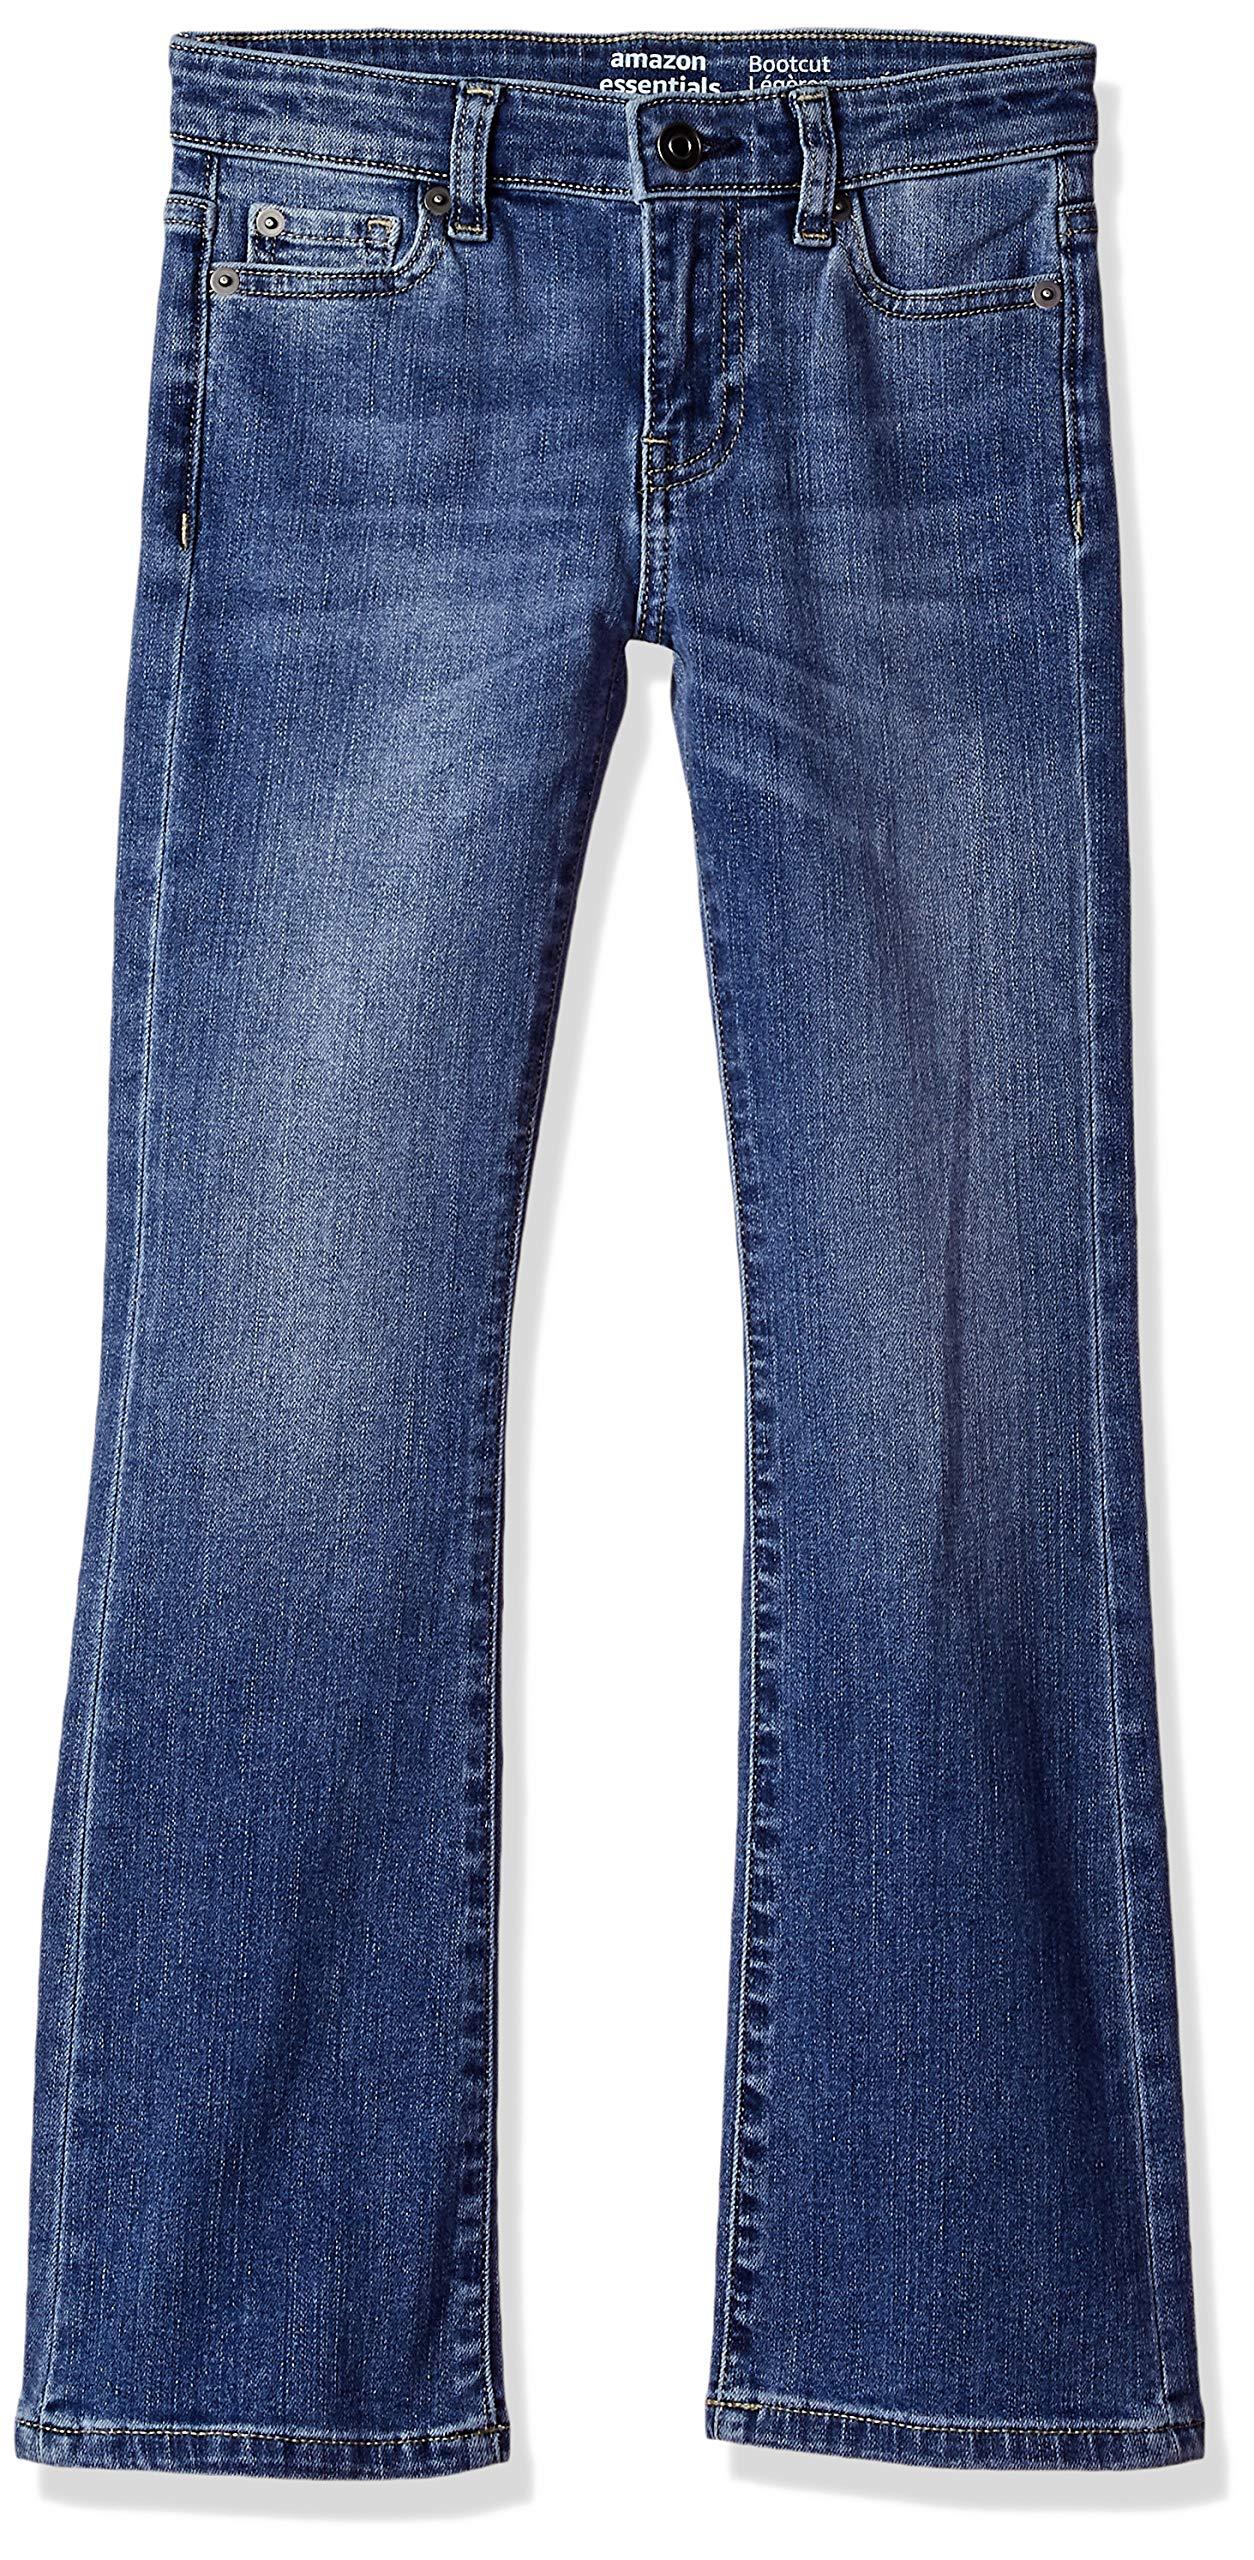 Amazon Essentials Big Girls' Boot-Cut Jeans, Arizona/Light,12 by Amazon Essentials